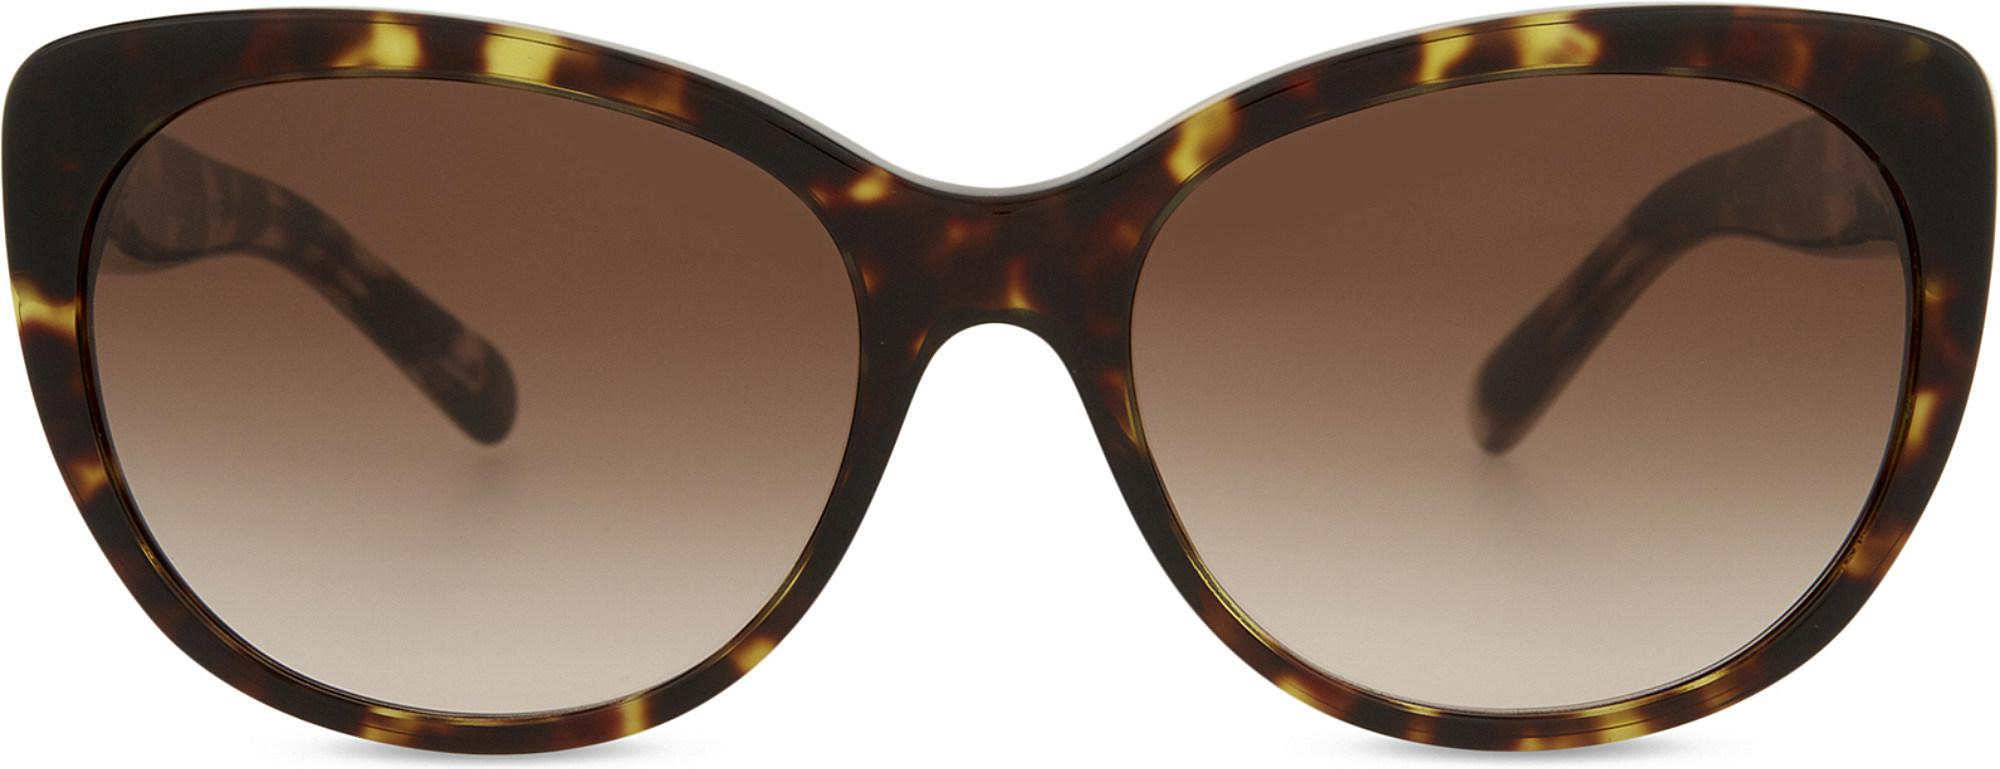 bc6620fa1005 Burberry Be4224 Cat-eye Tortoiseshell Sunglasses in Brown - Lyst